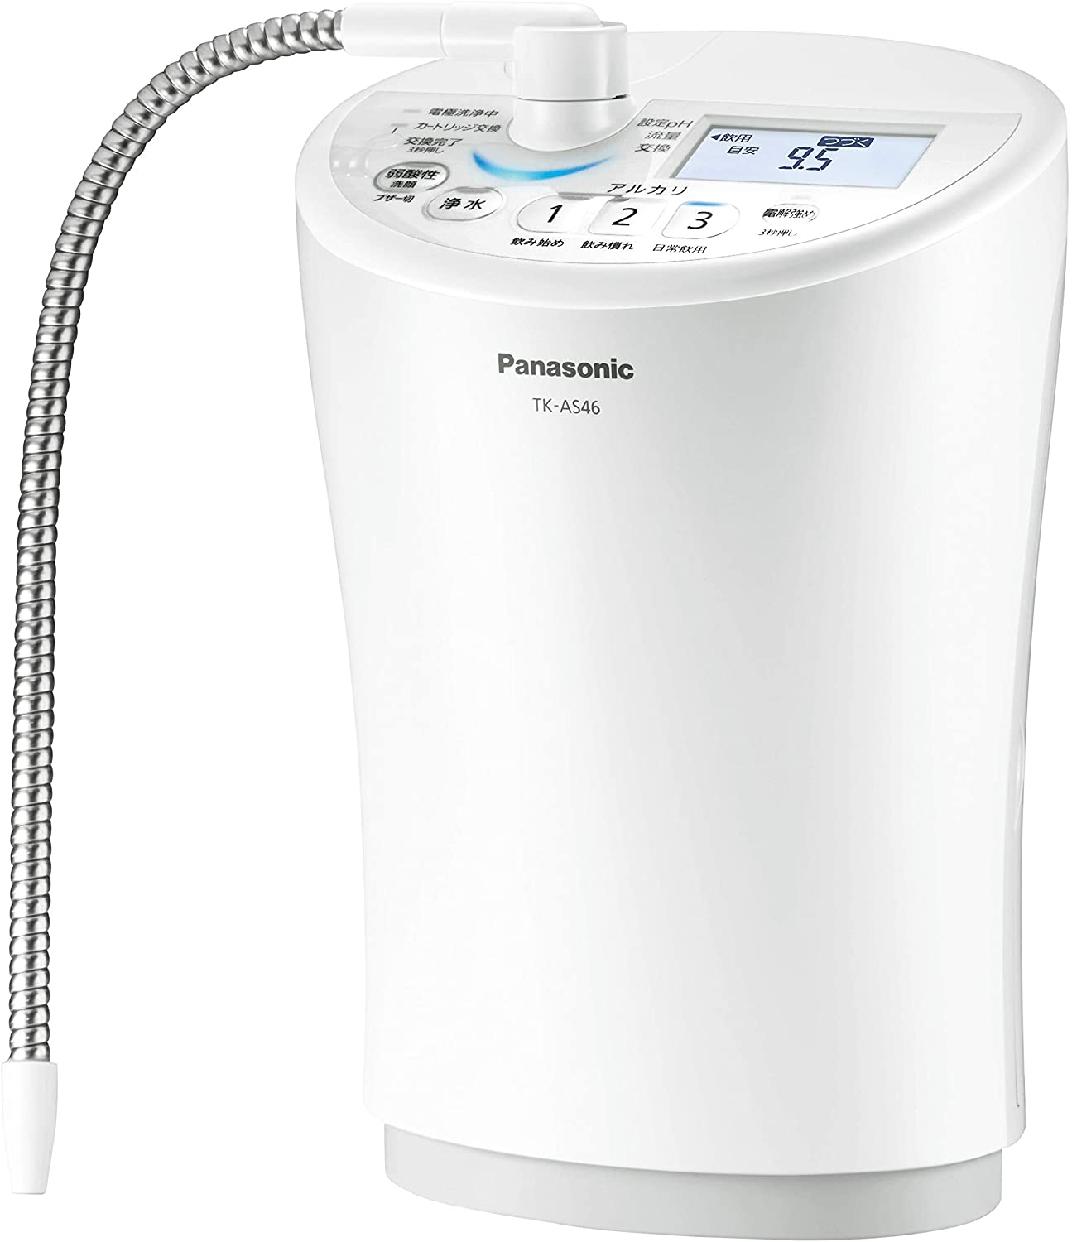 Panasonic(パナソニック)アルカリイオン整水器 TK-AS46の商品画像